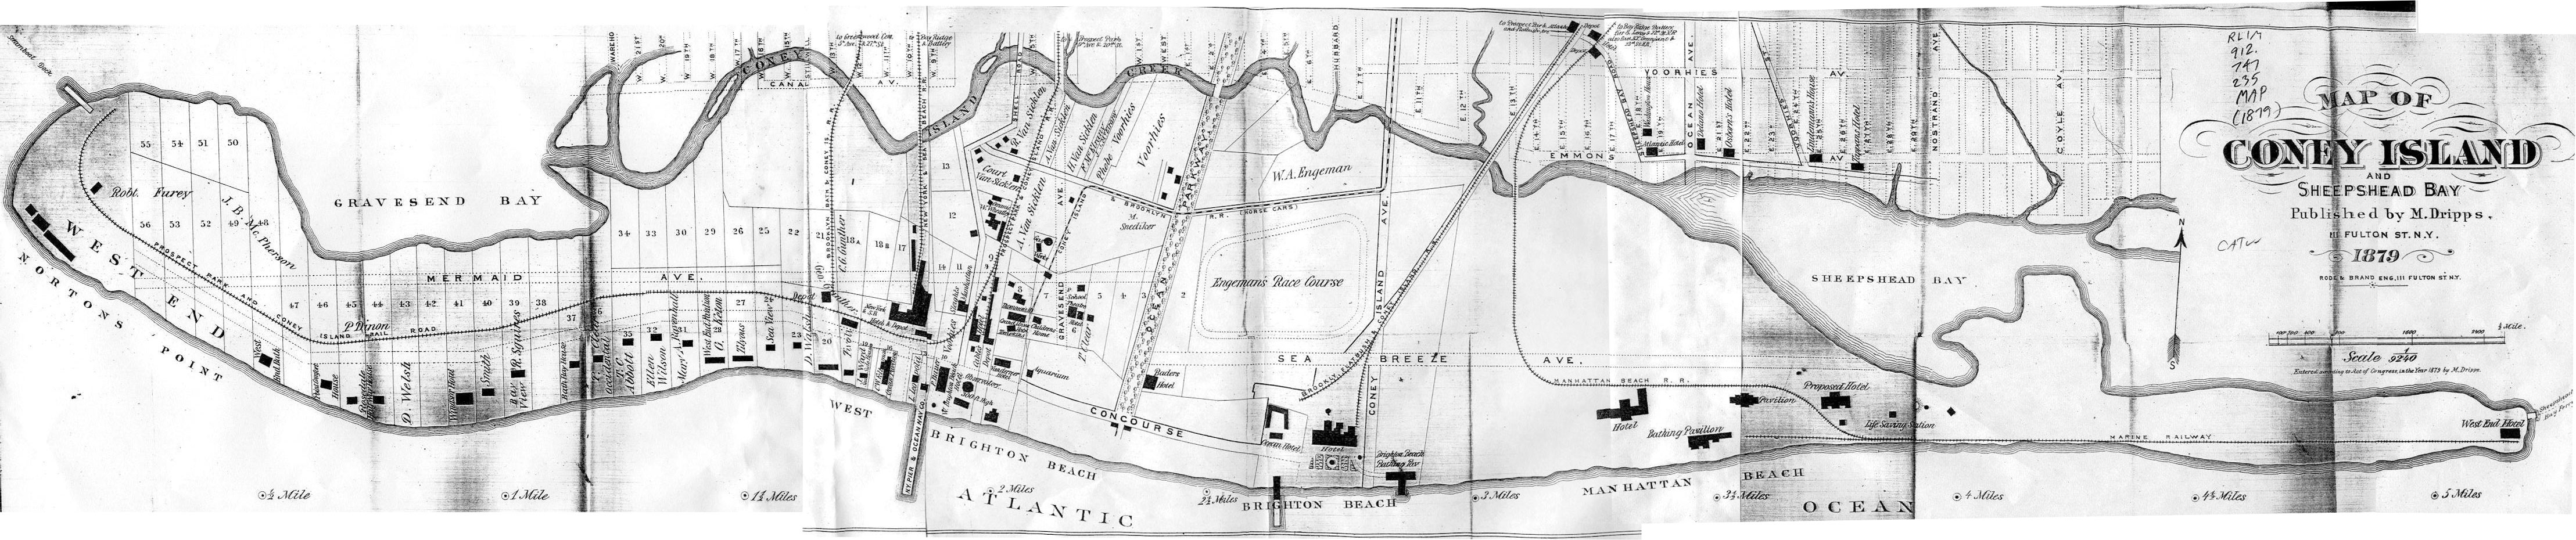 Coney Island History S